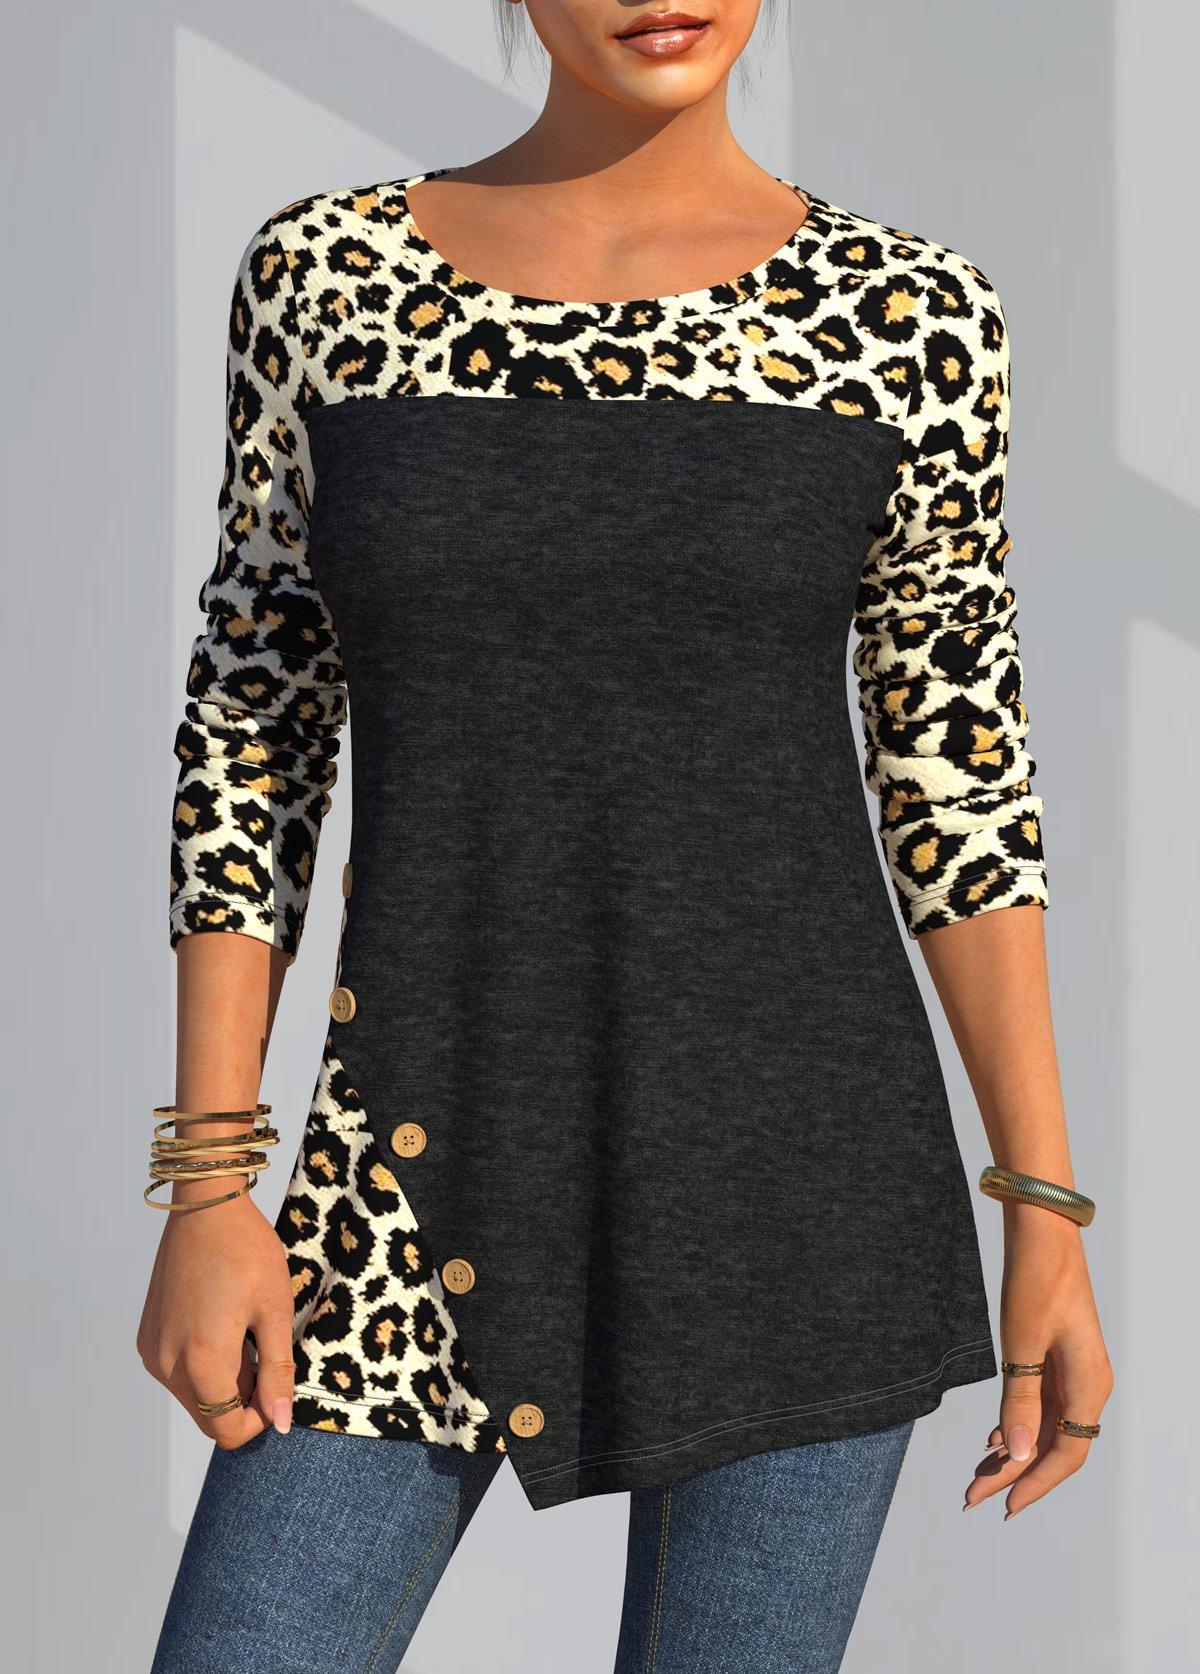 ROTITA Leopard Decorative Button Round Neck Long Sleeve T Shirt